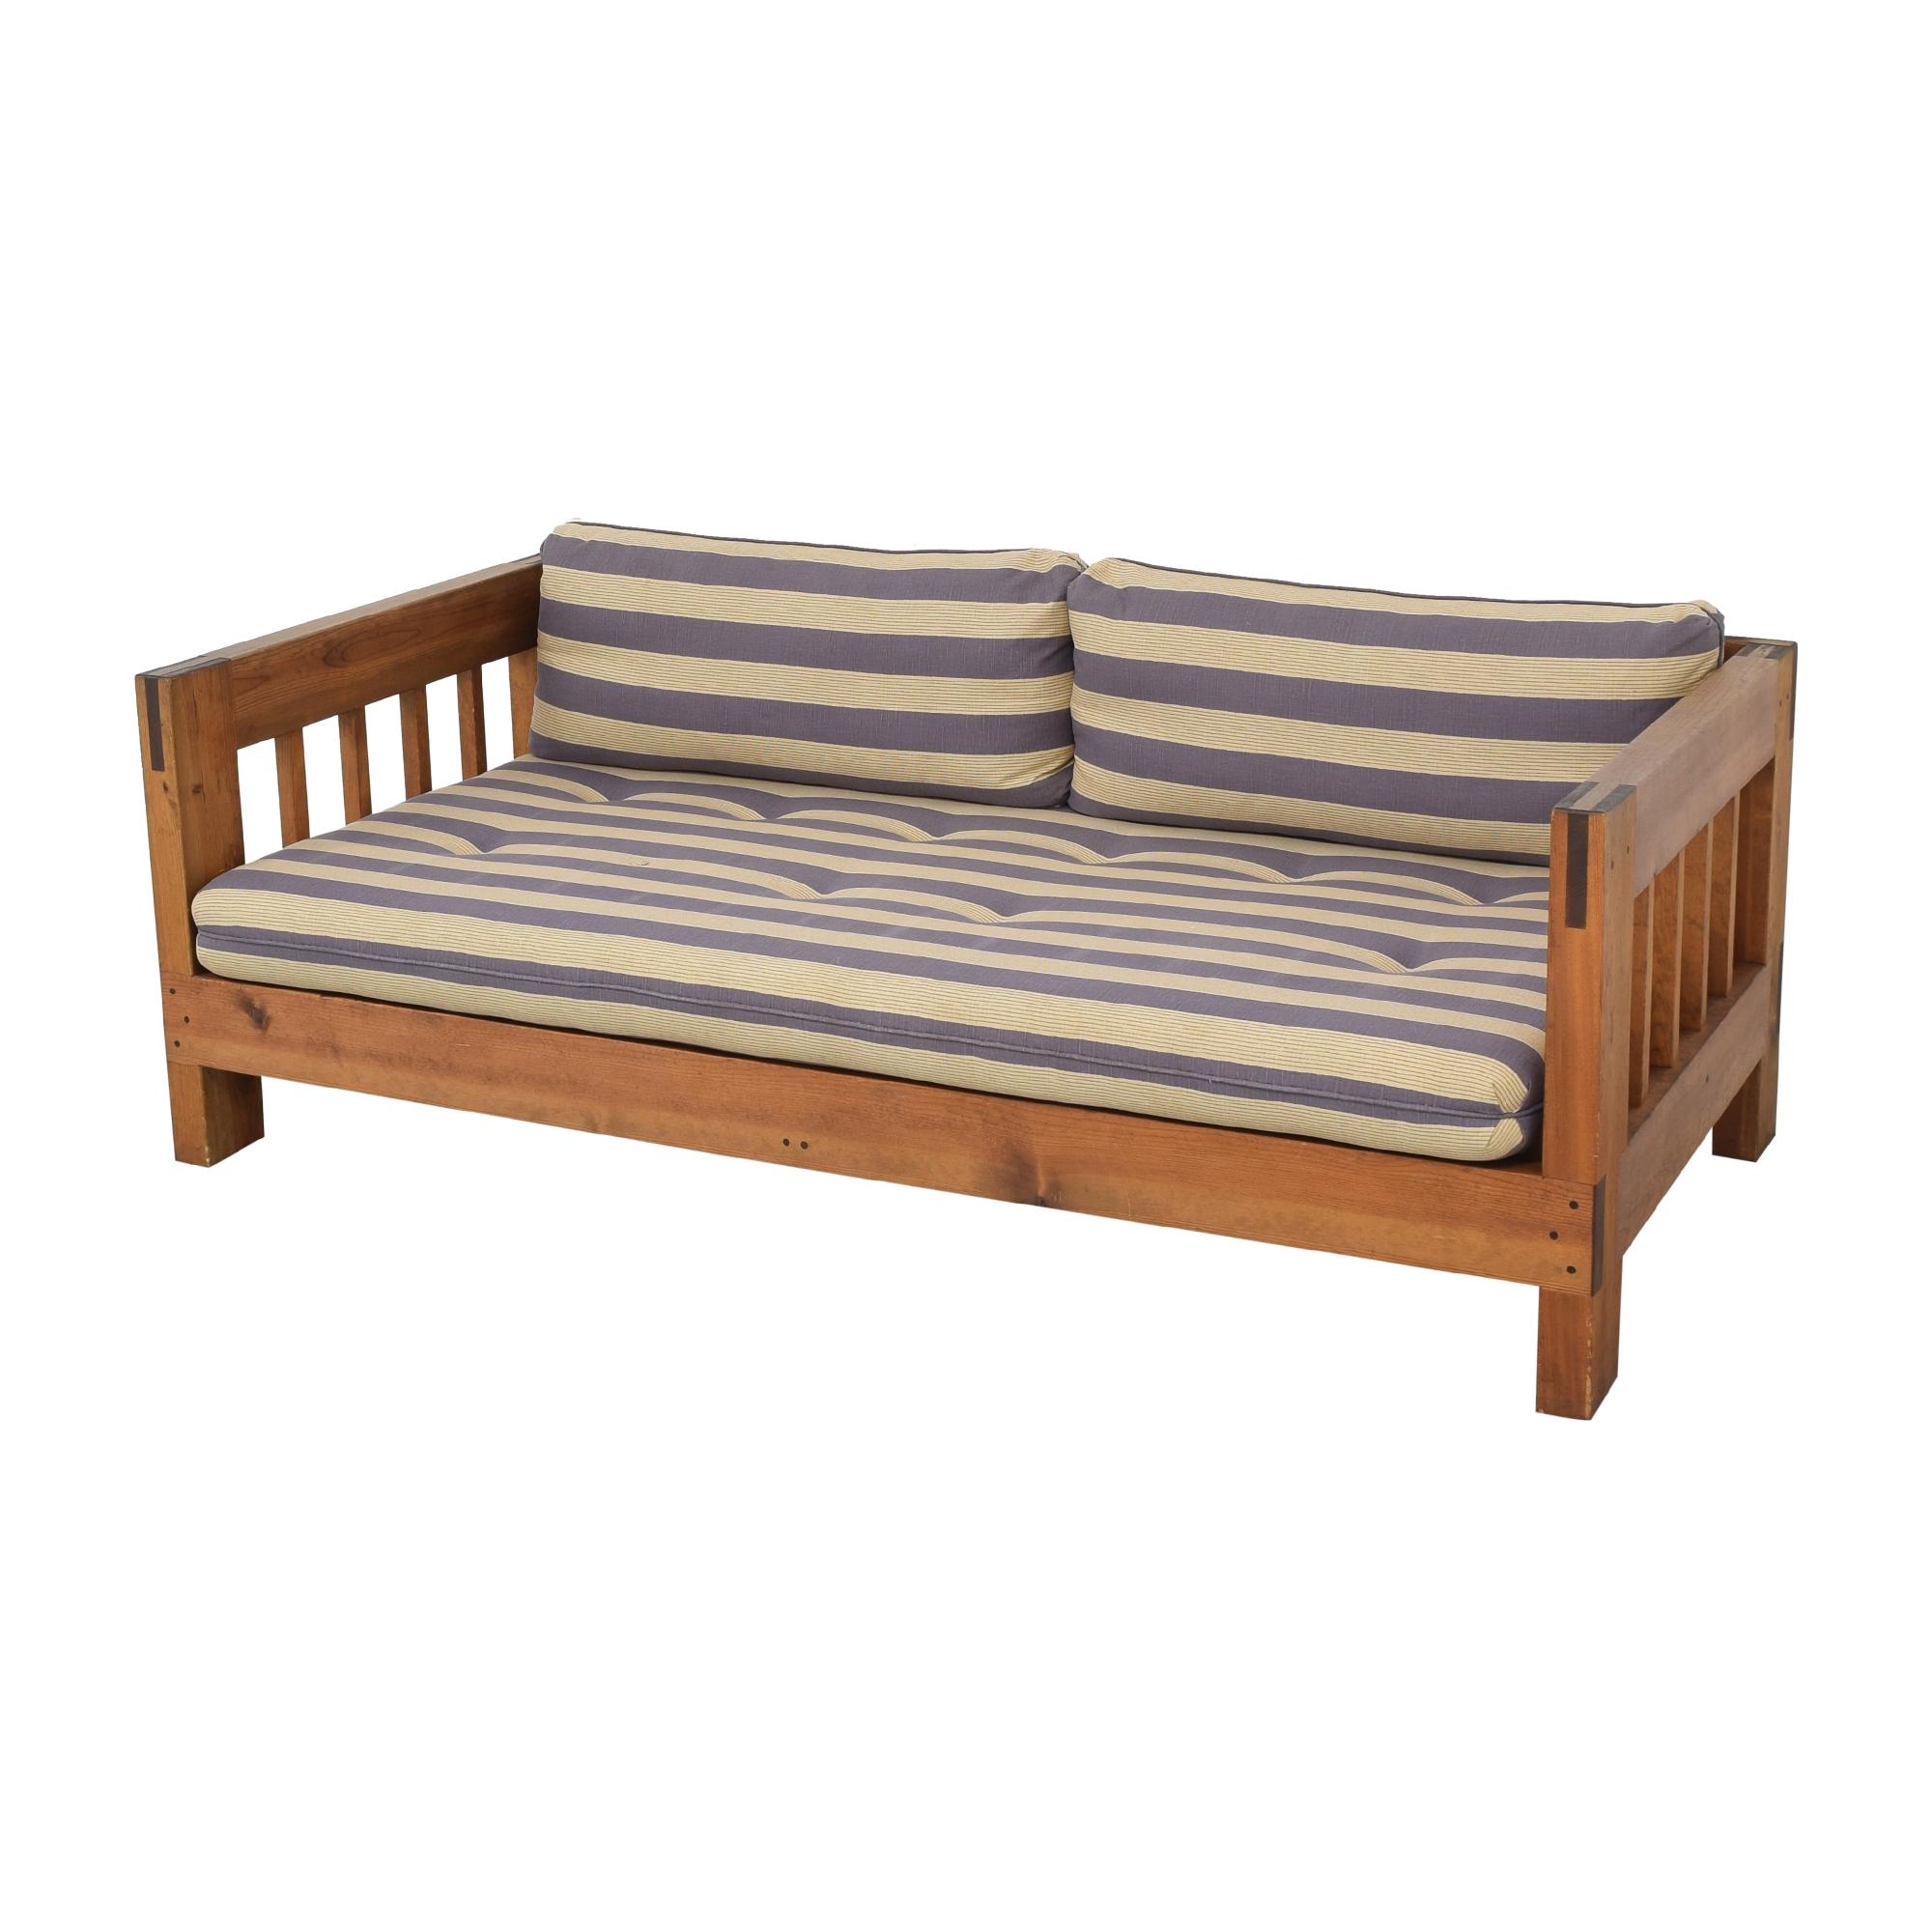 Taos Furniture Toas Furniture Galisteo Sofa ct